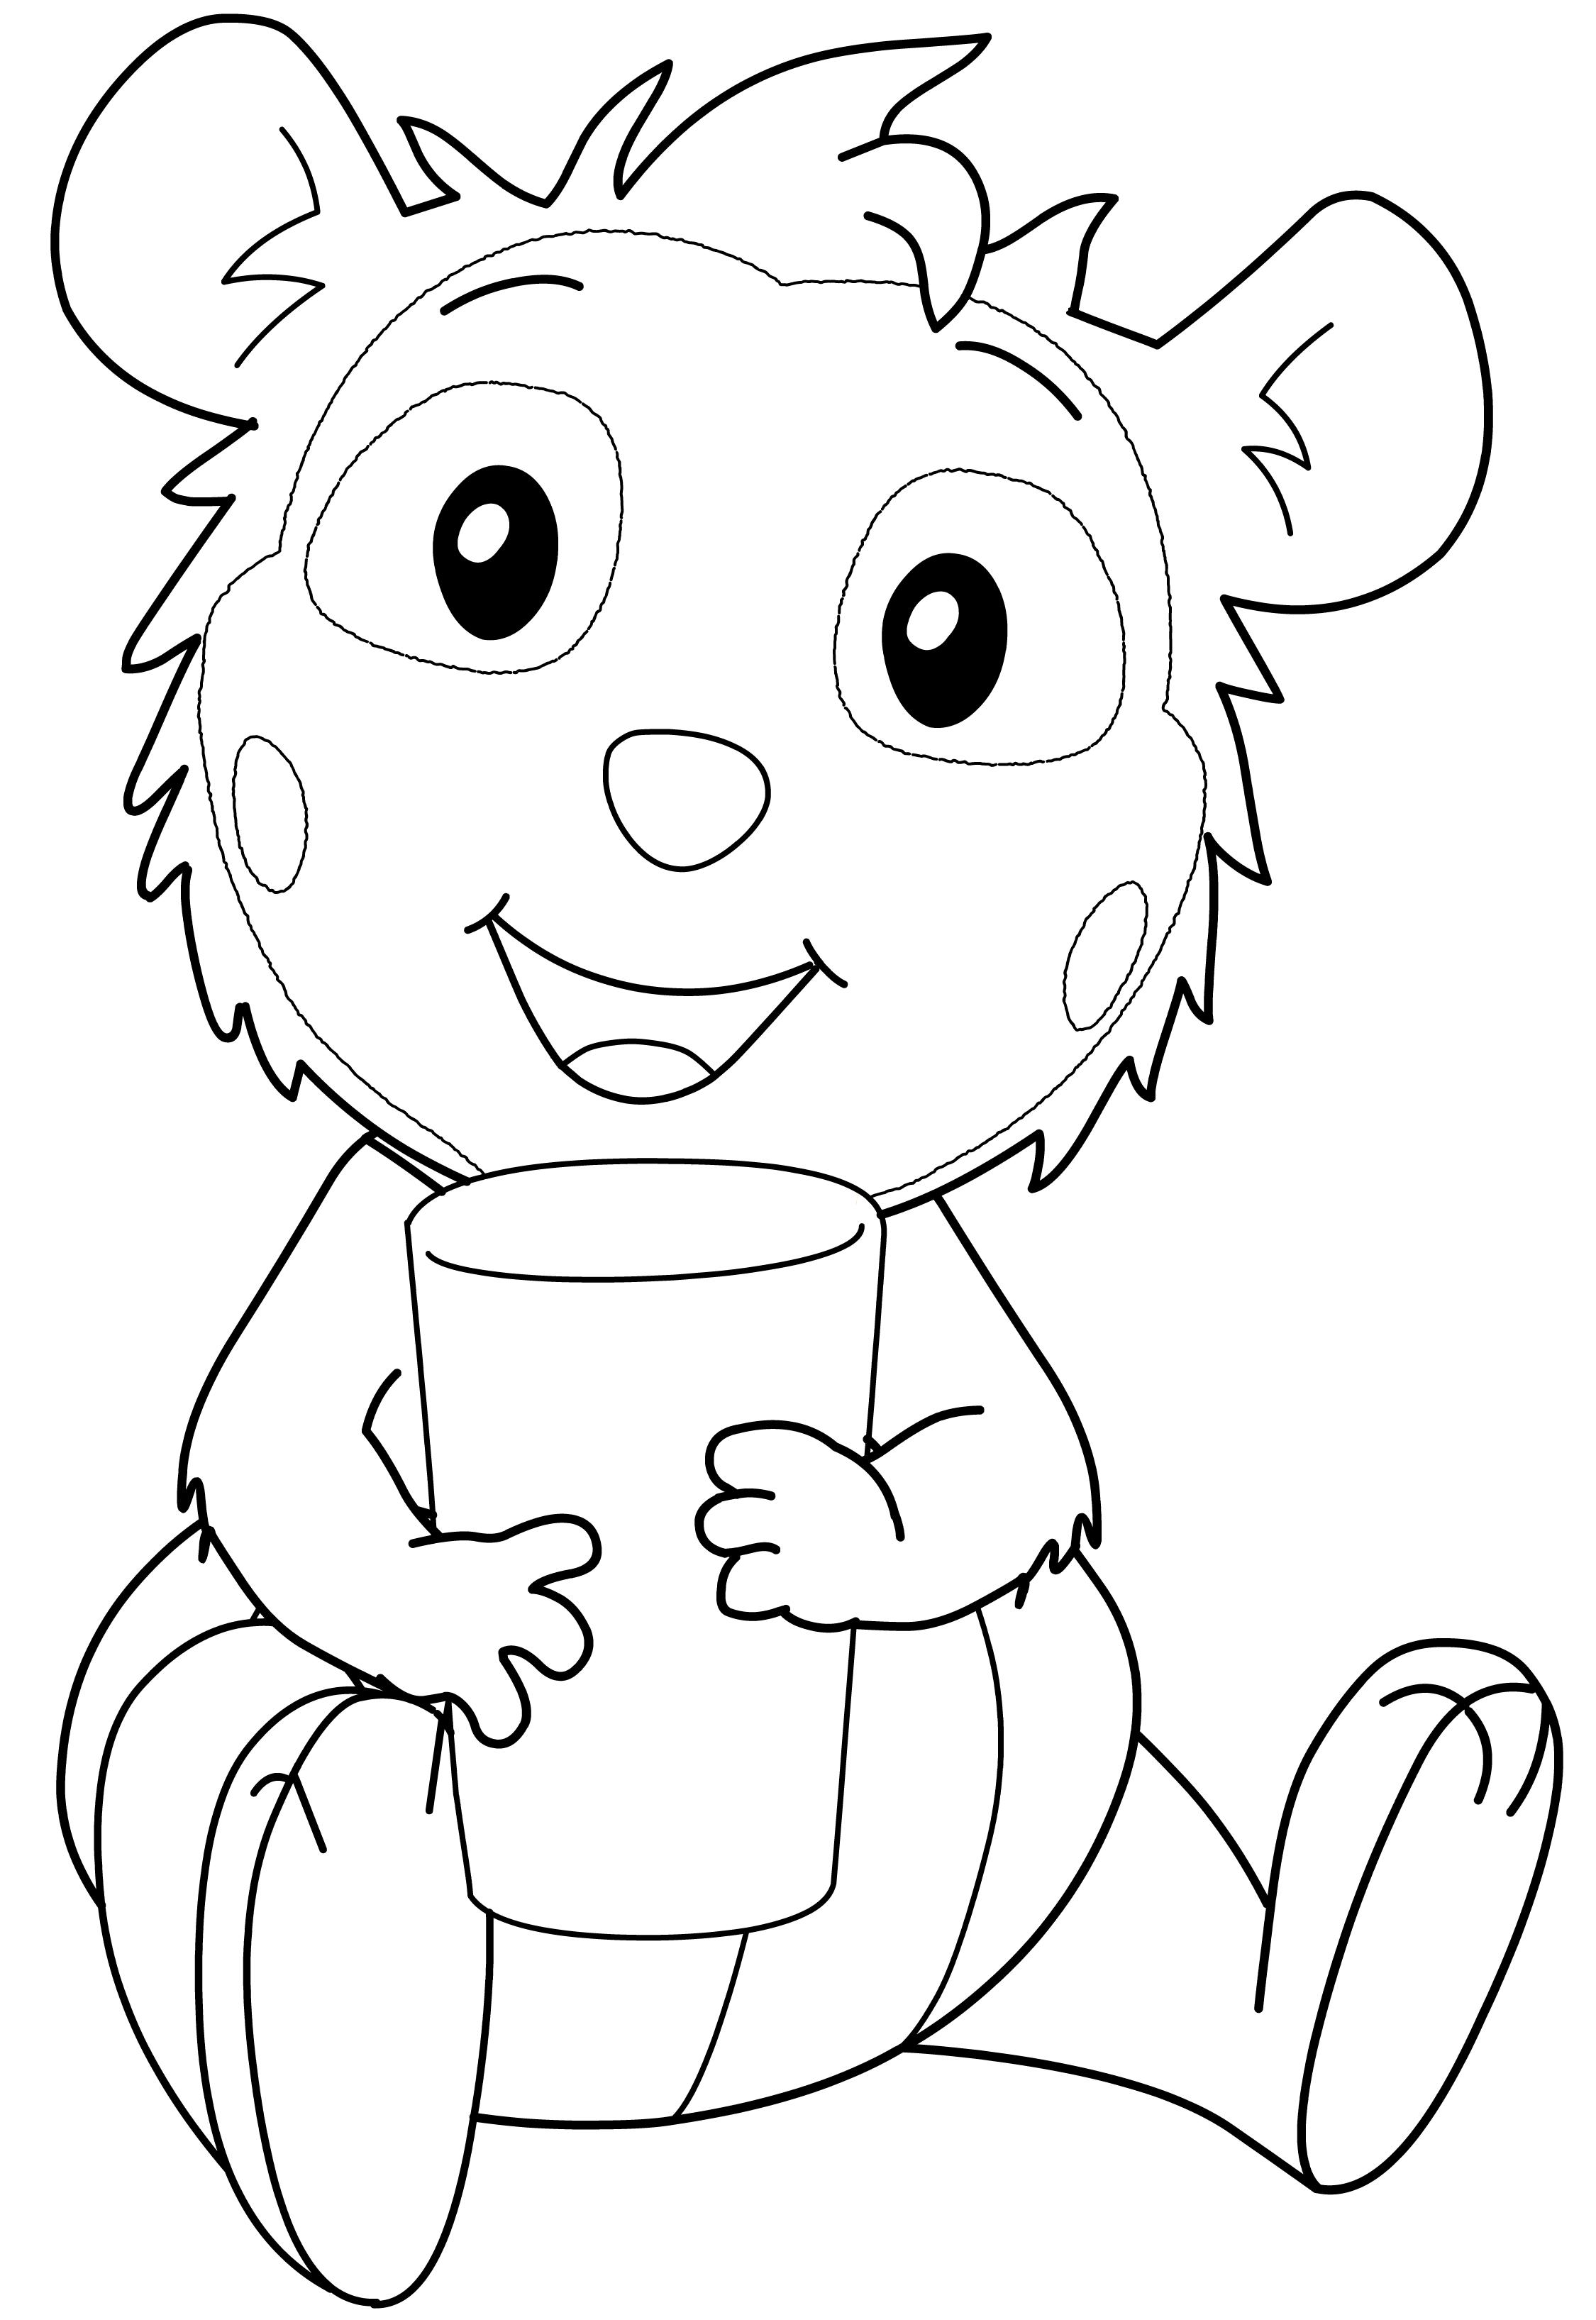 Malvorlage Bobo Siebenschlafer Food Ideas In 2021 Bobo Mario Characters Hello Kitty